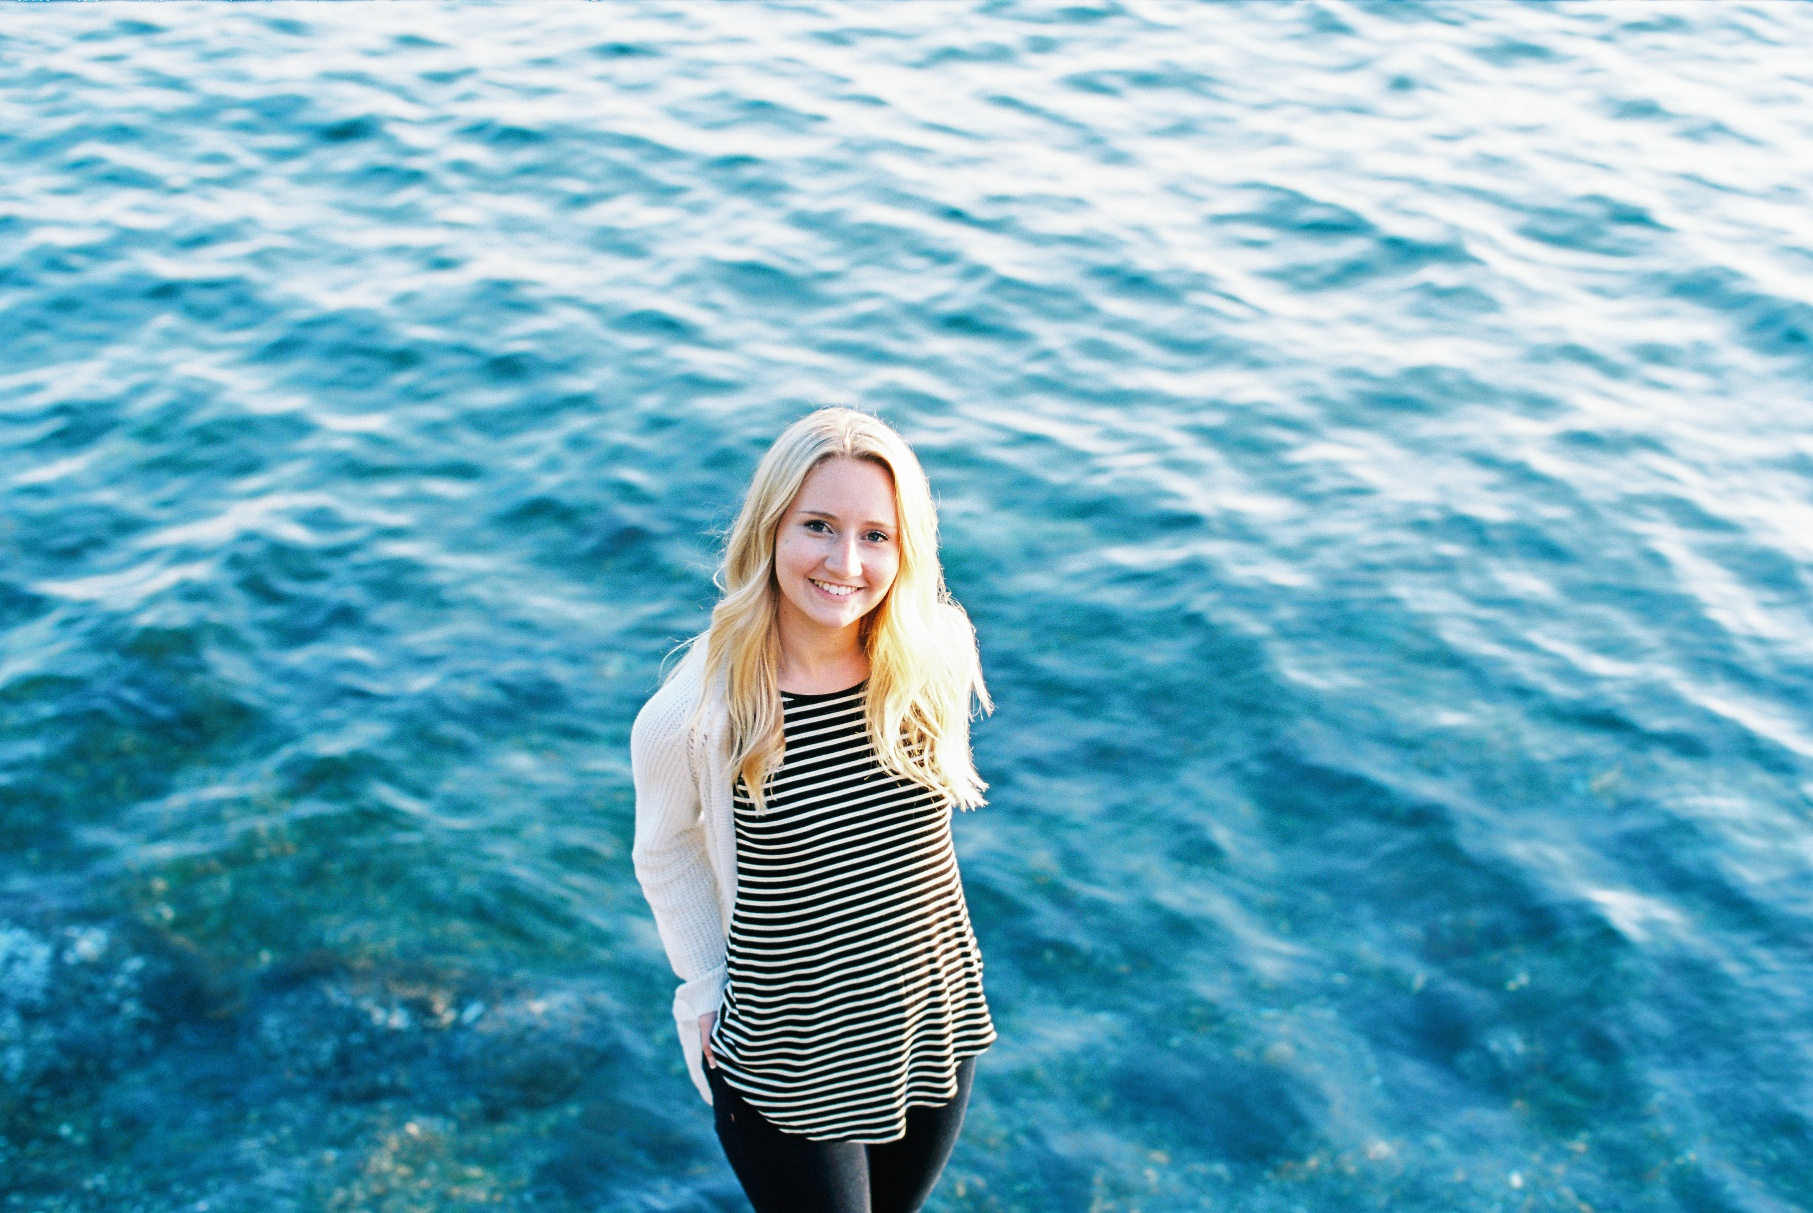 seattle film photographer senior pictures photos alki beach west seattle ocean canon kodak ektar 100 film